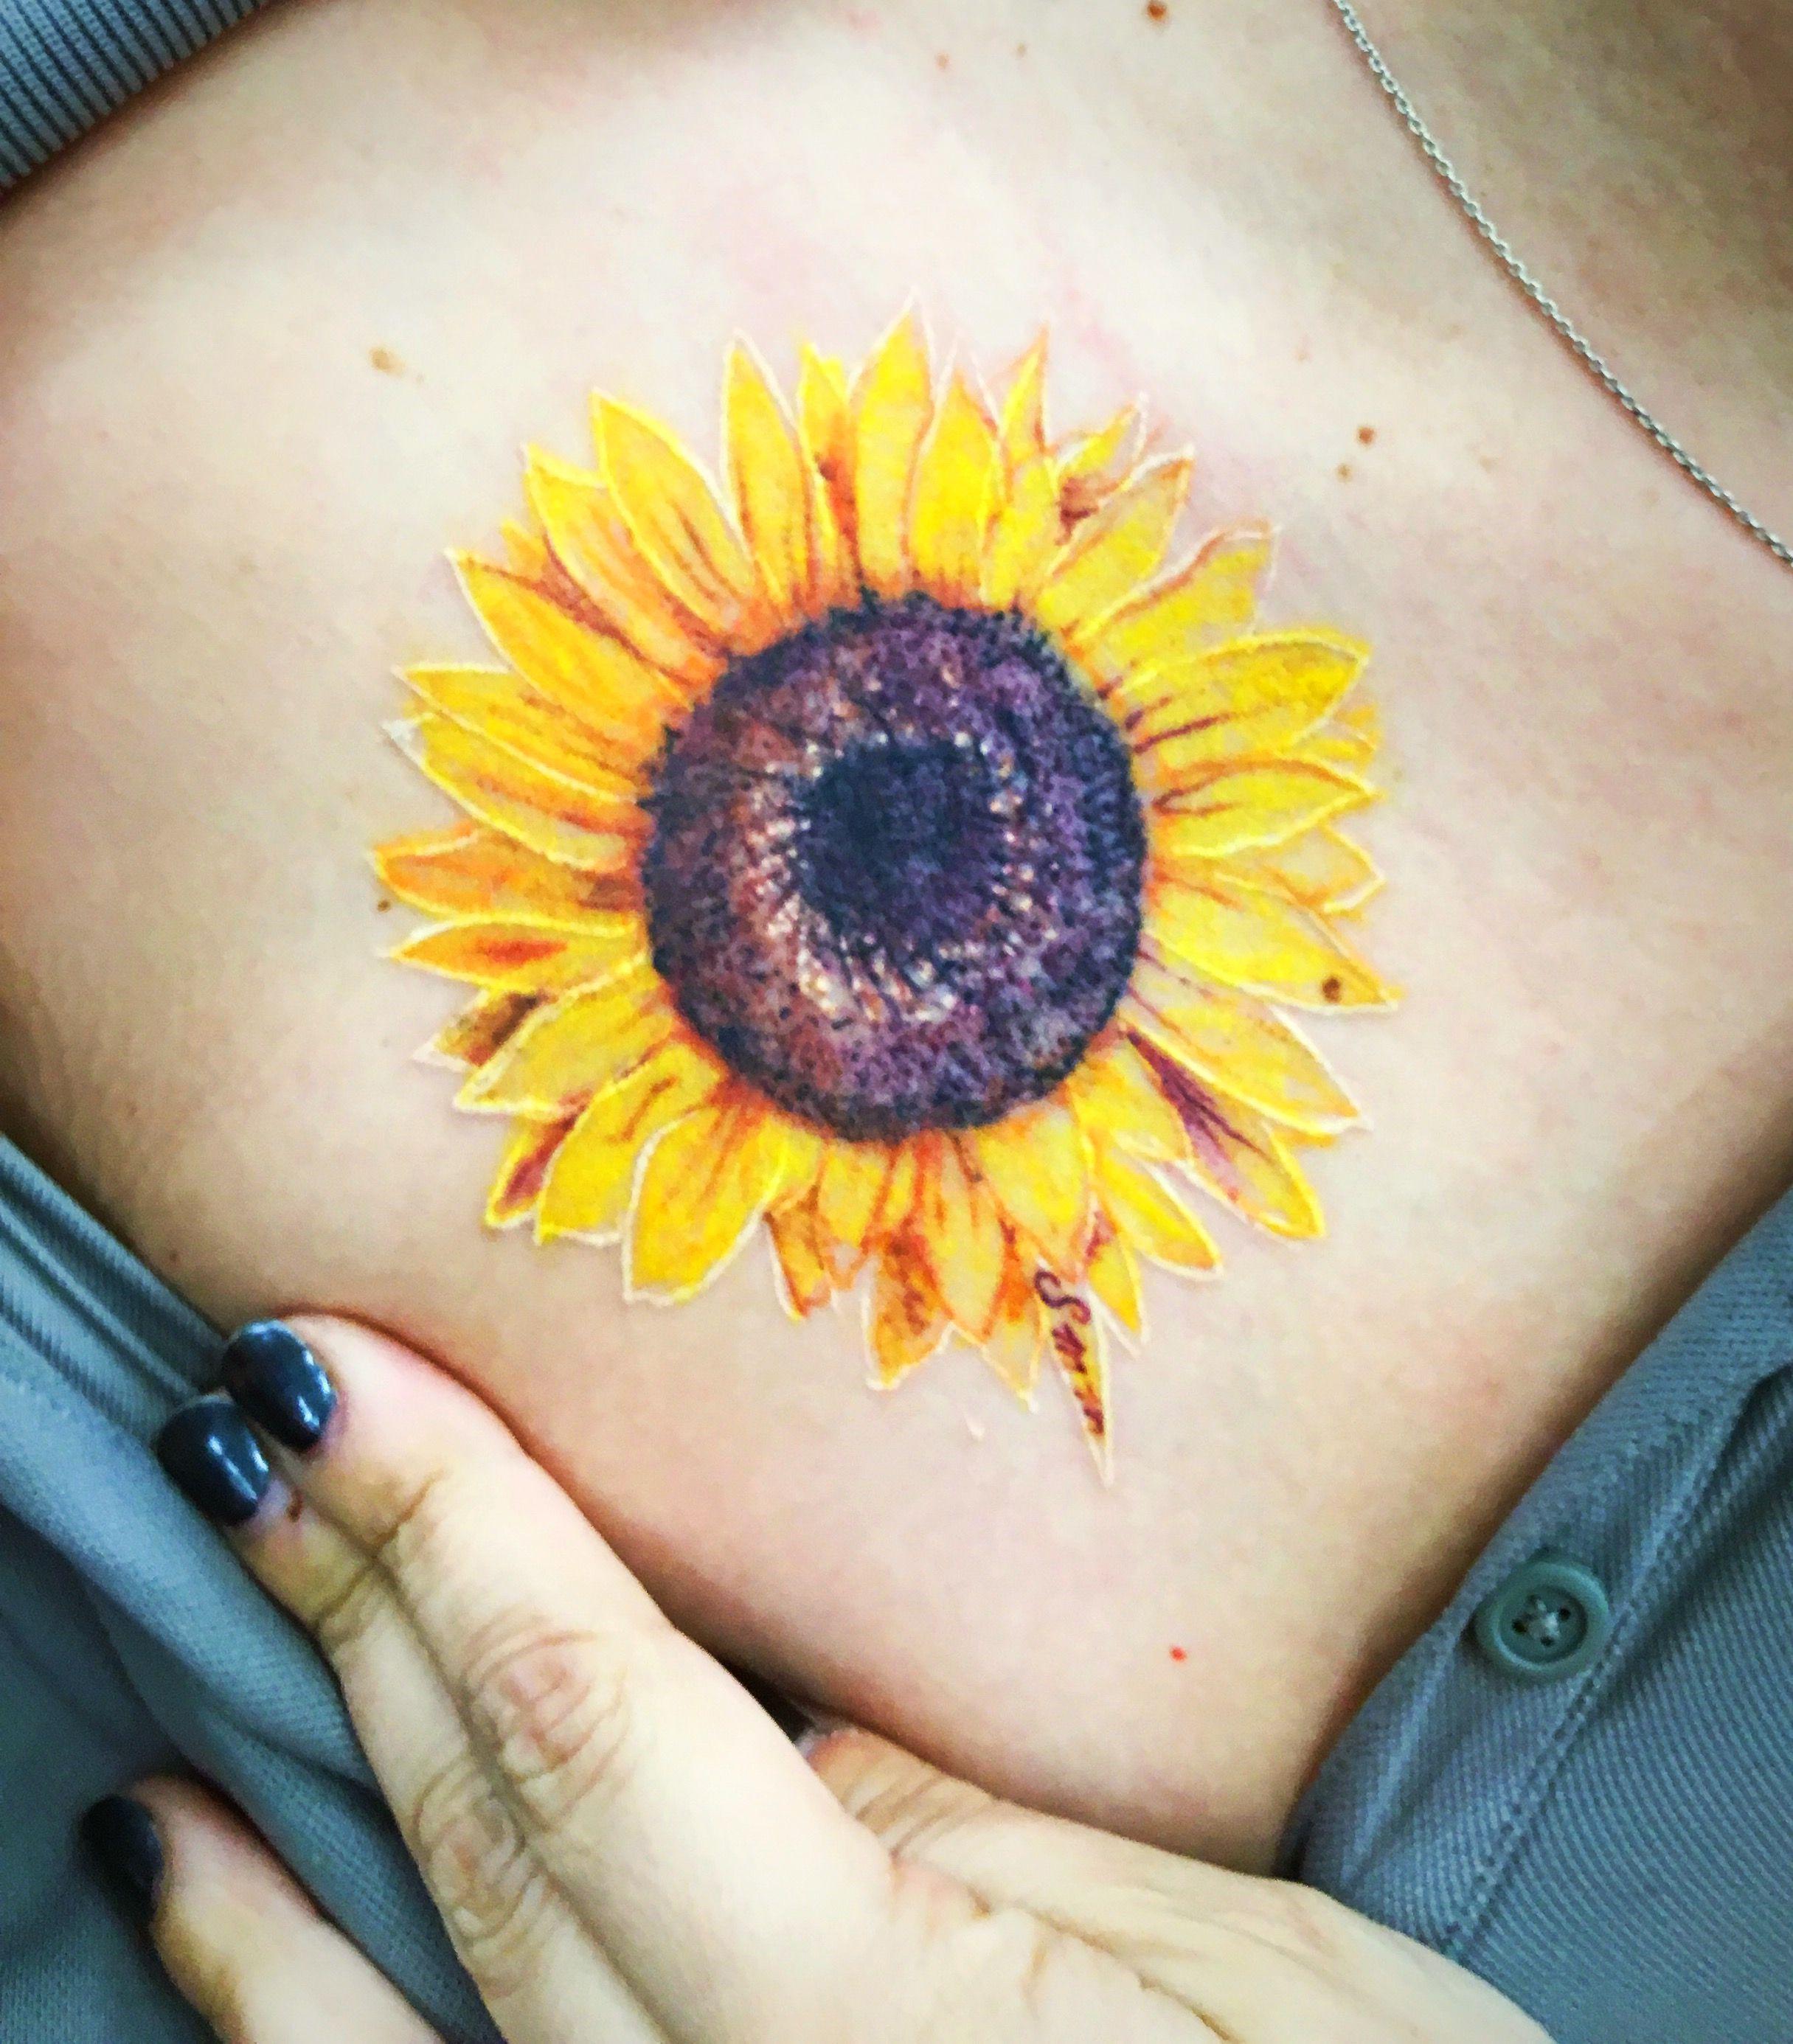 Sunflower Tattoo Sunflower Tattoos Sunflower Tattoo Sunflower